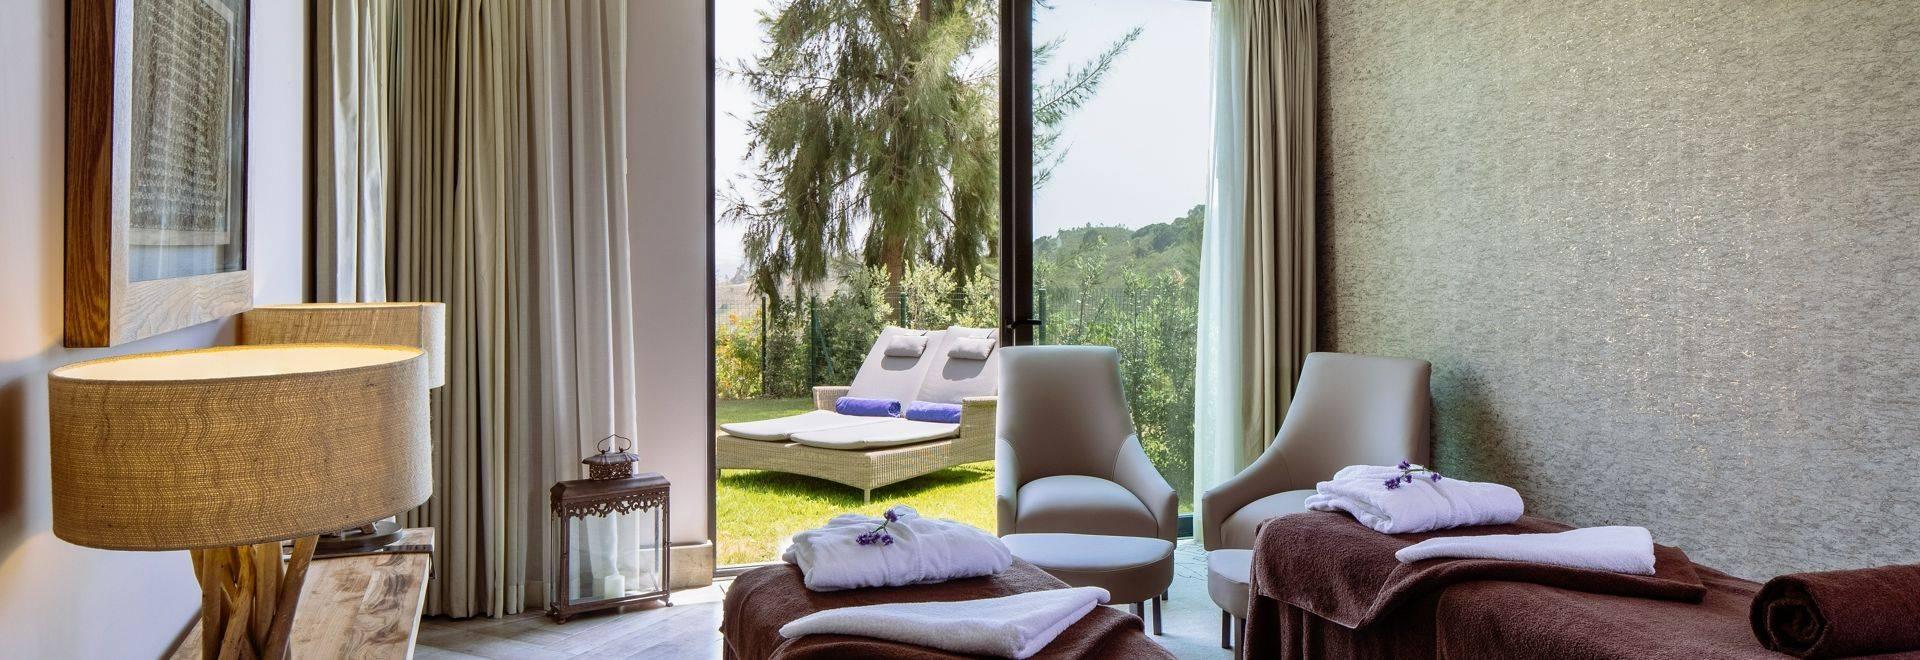 Macdonald-Monchique-spa-treatment-room.jpg